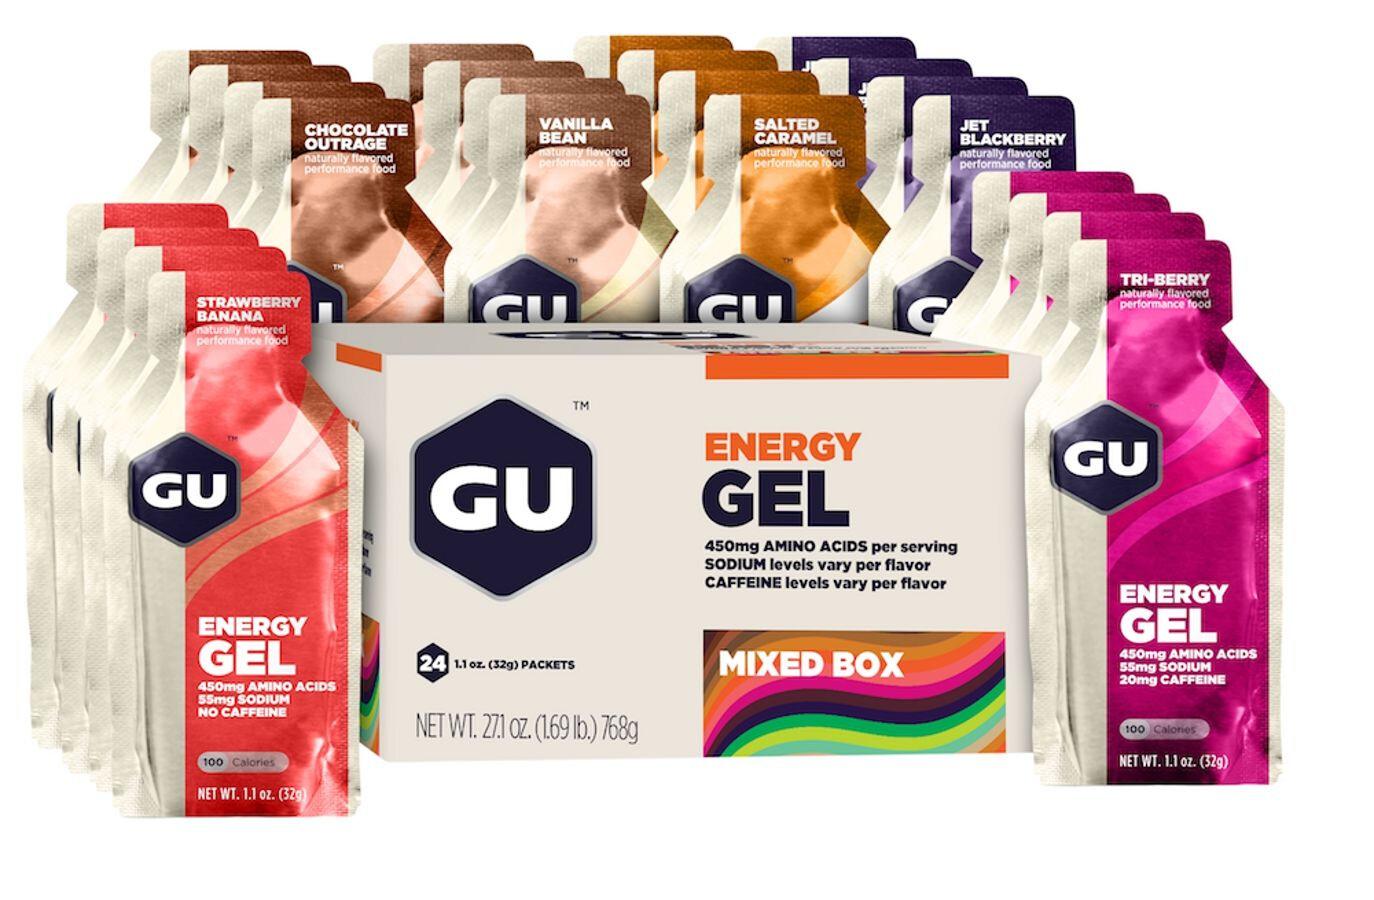 GU Energy Gel Box 24x32g, Mixed   Energy gels